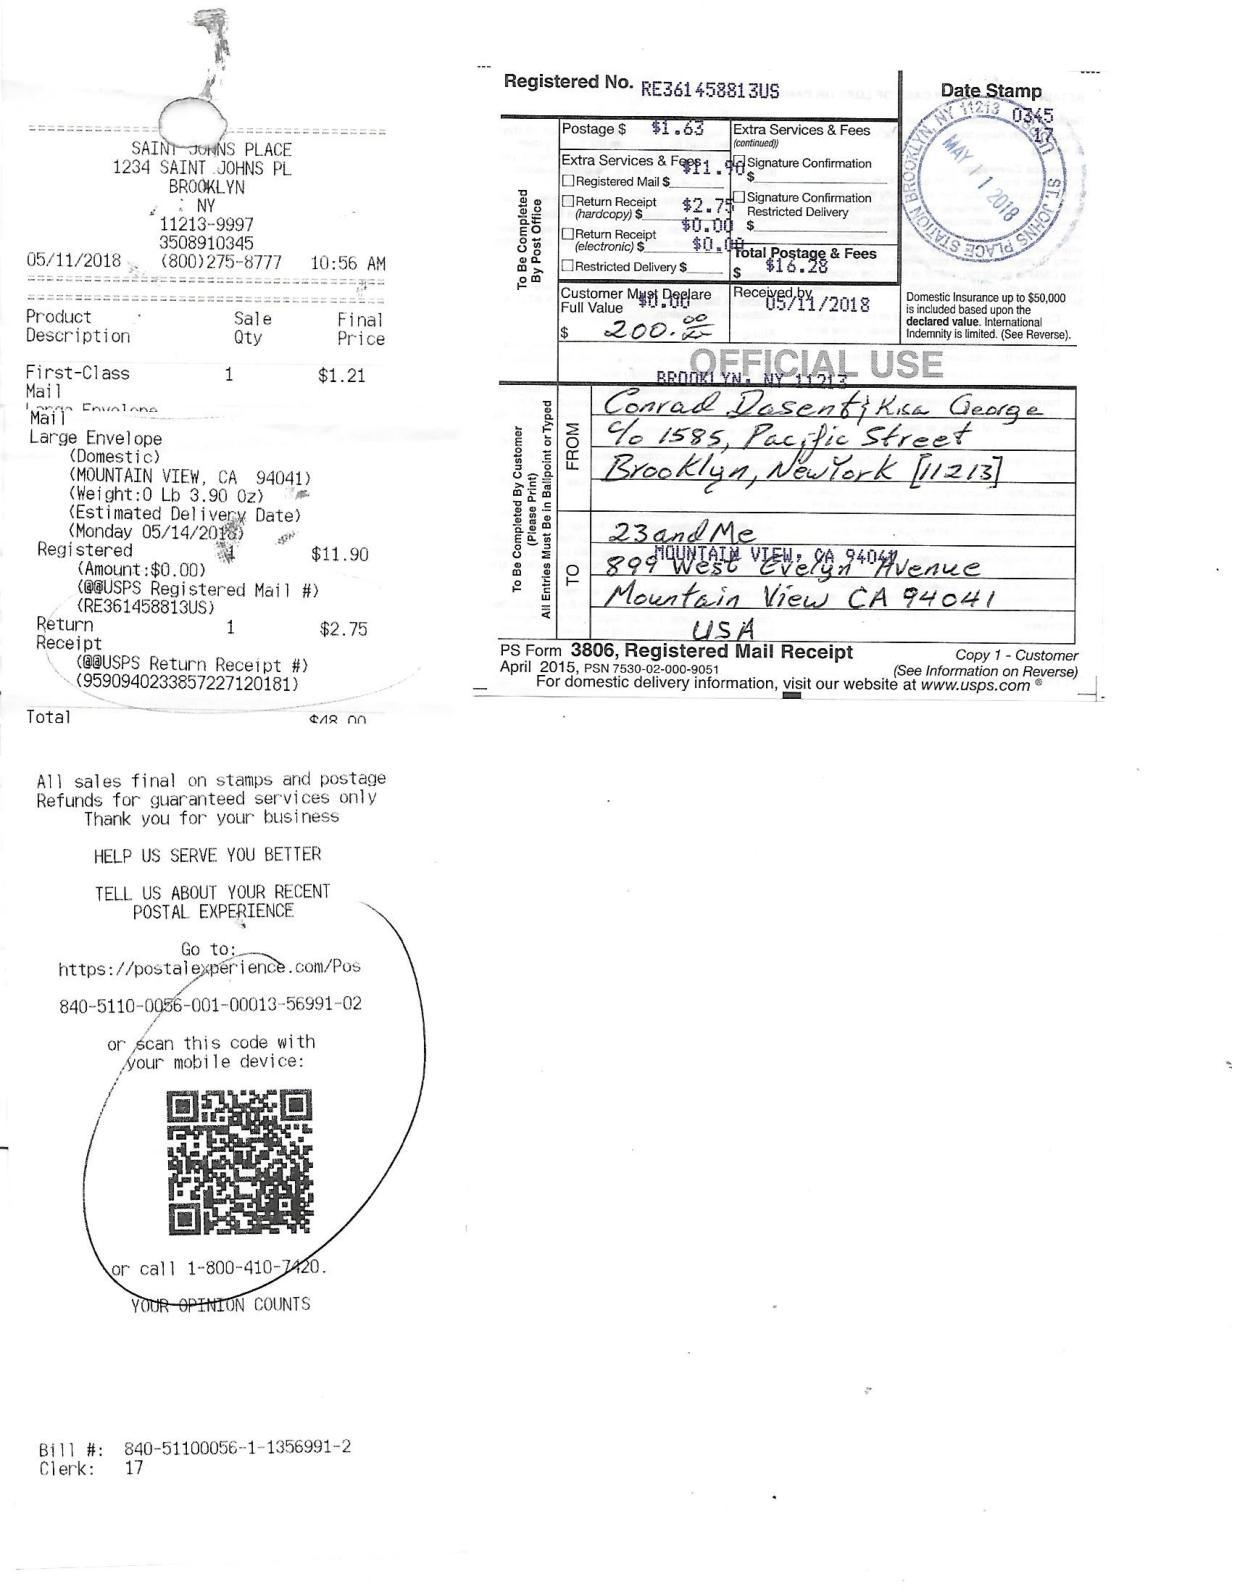 Calaméo - 23andMe Affidavit of Breach of Contract